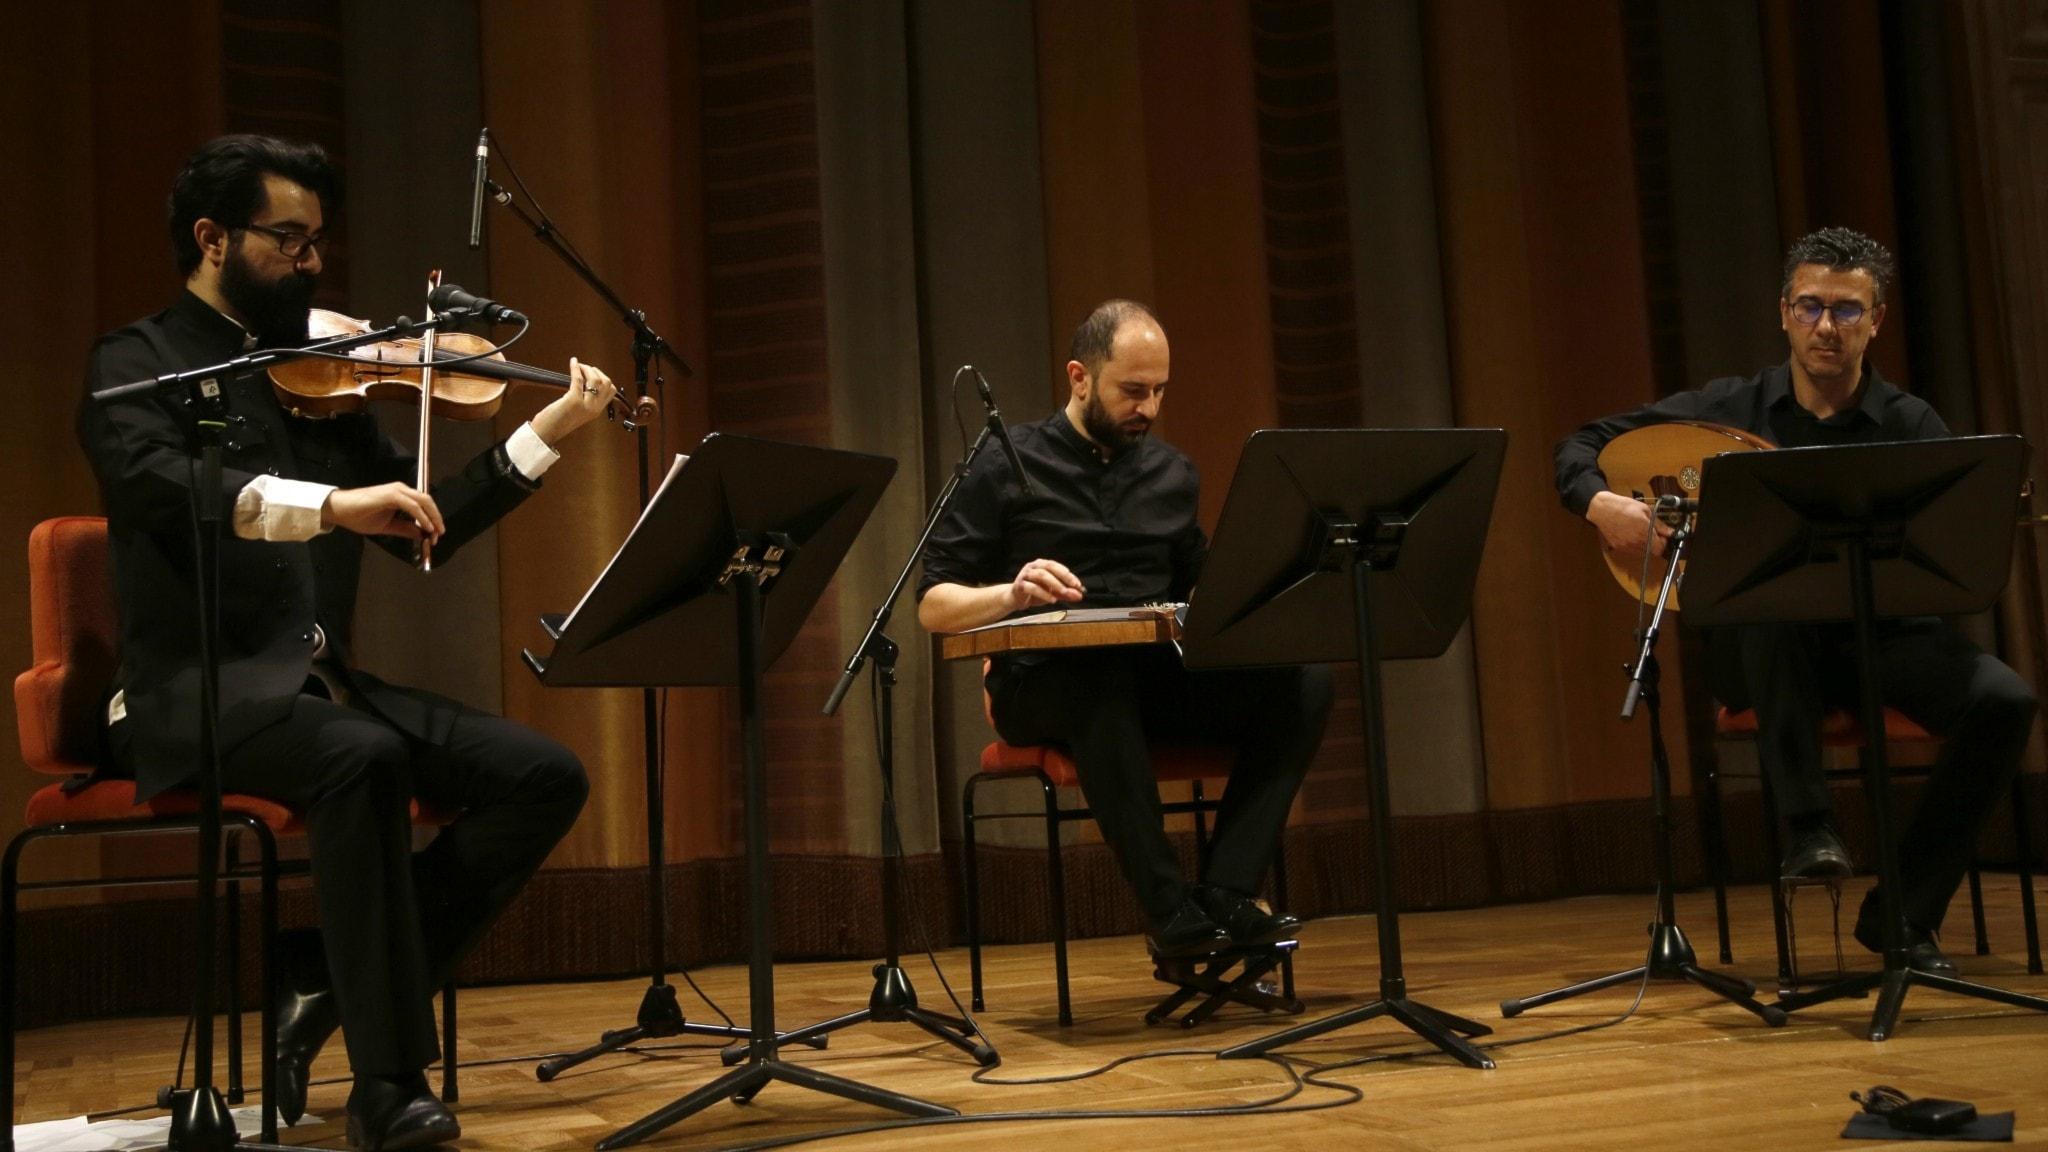 KONSERT: Orientalisk kammarmusik med Sada trio